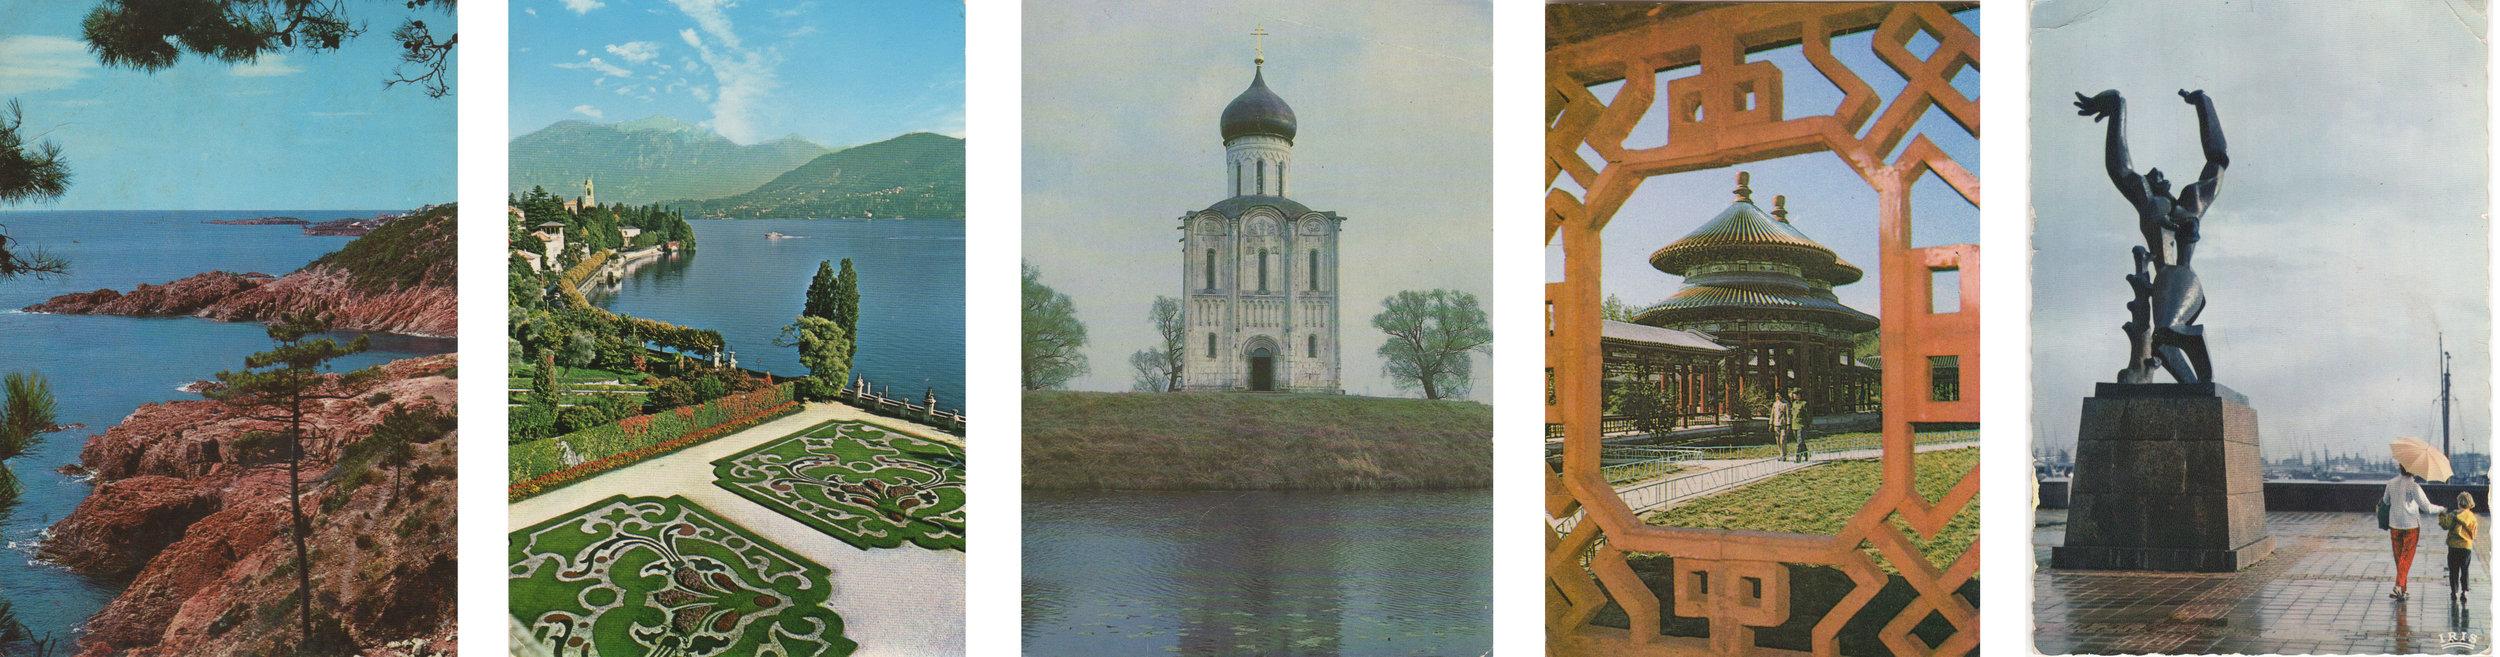 Sent from: L'Esterel, Lake Como, Vladimir, Beijing, Rotterdam